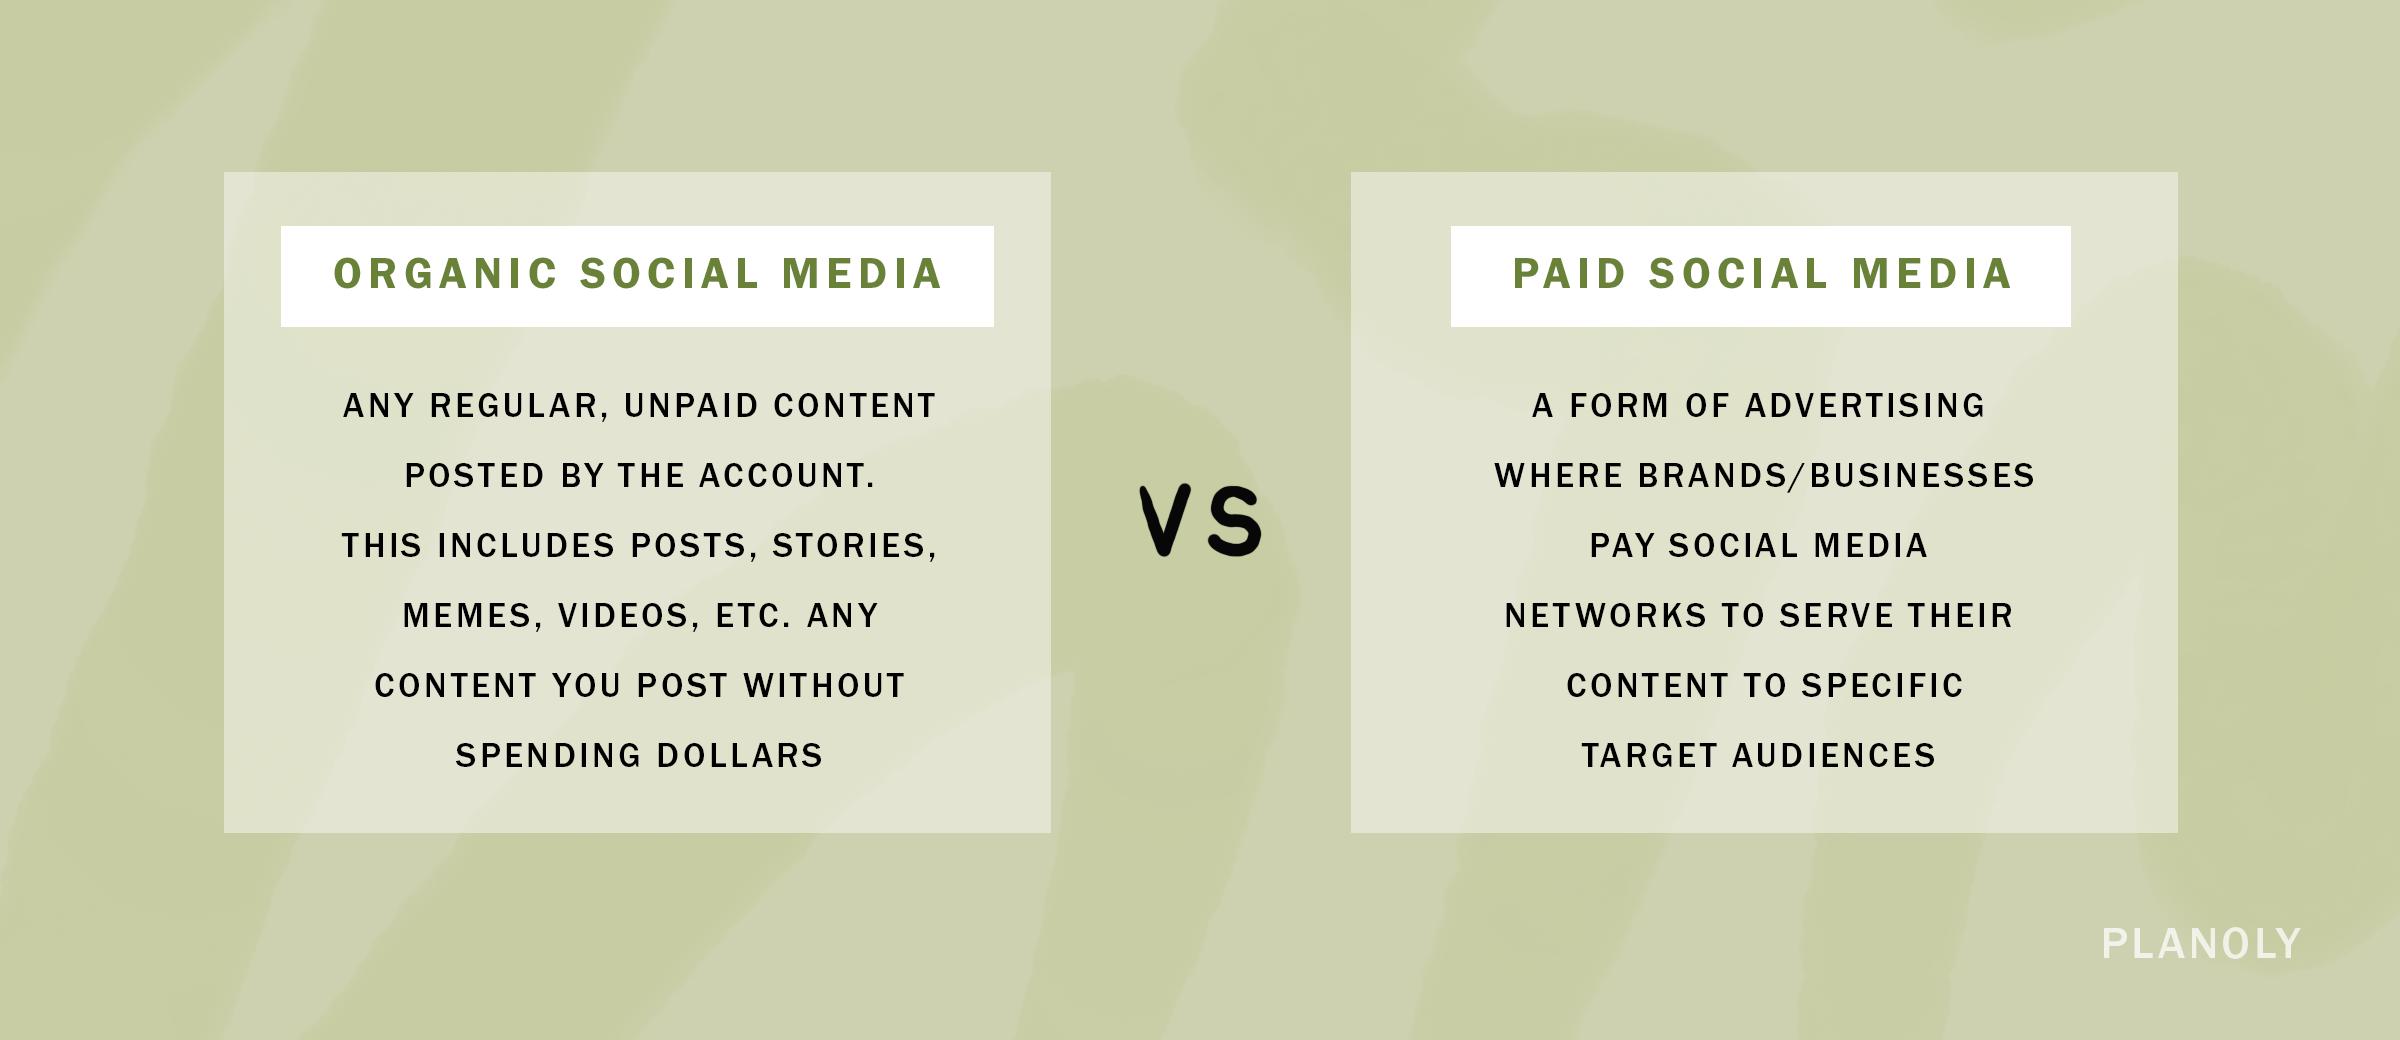 PLANOLY-Blog Post-Organic vs Paid Social-Image 1